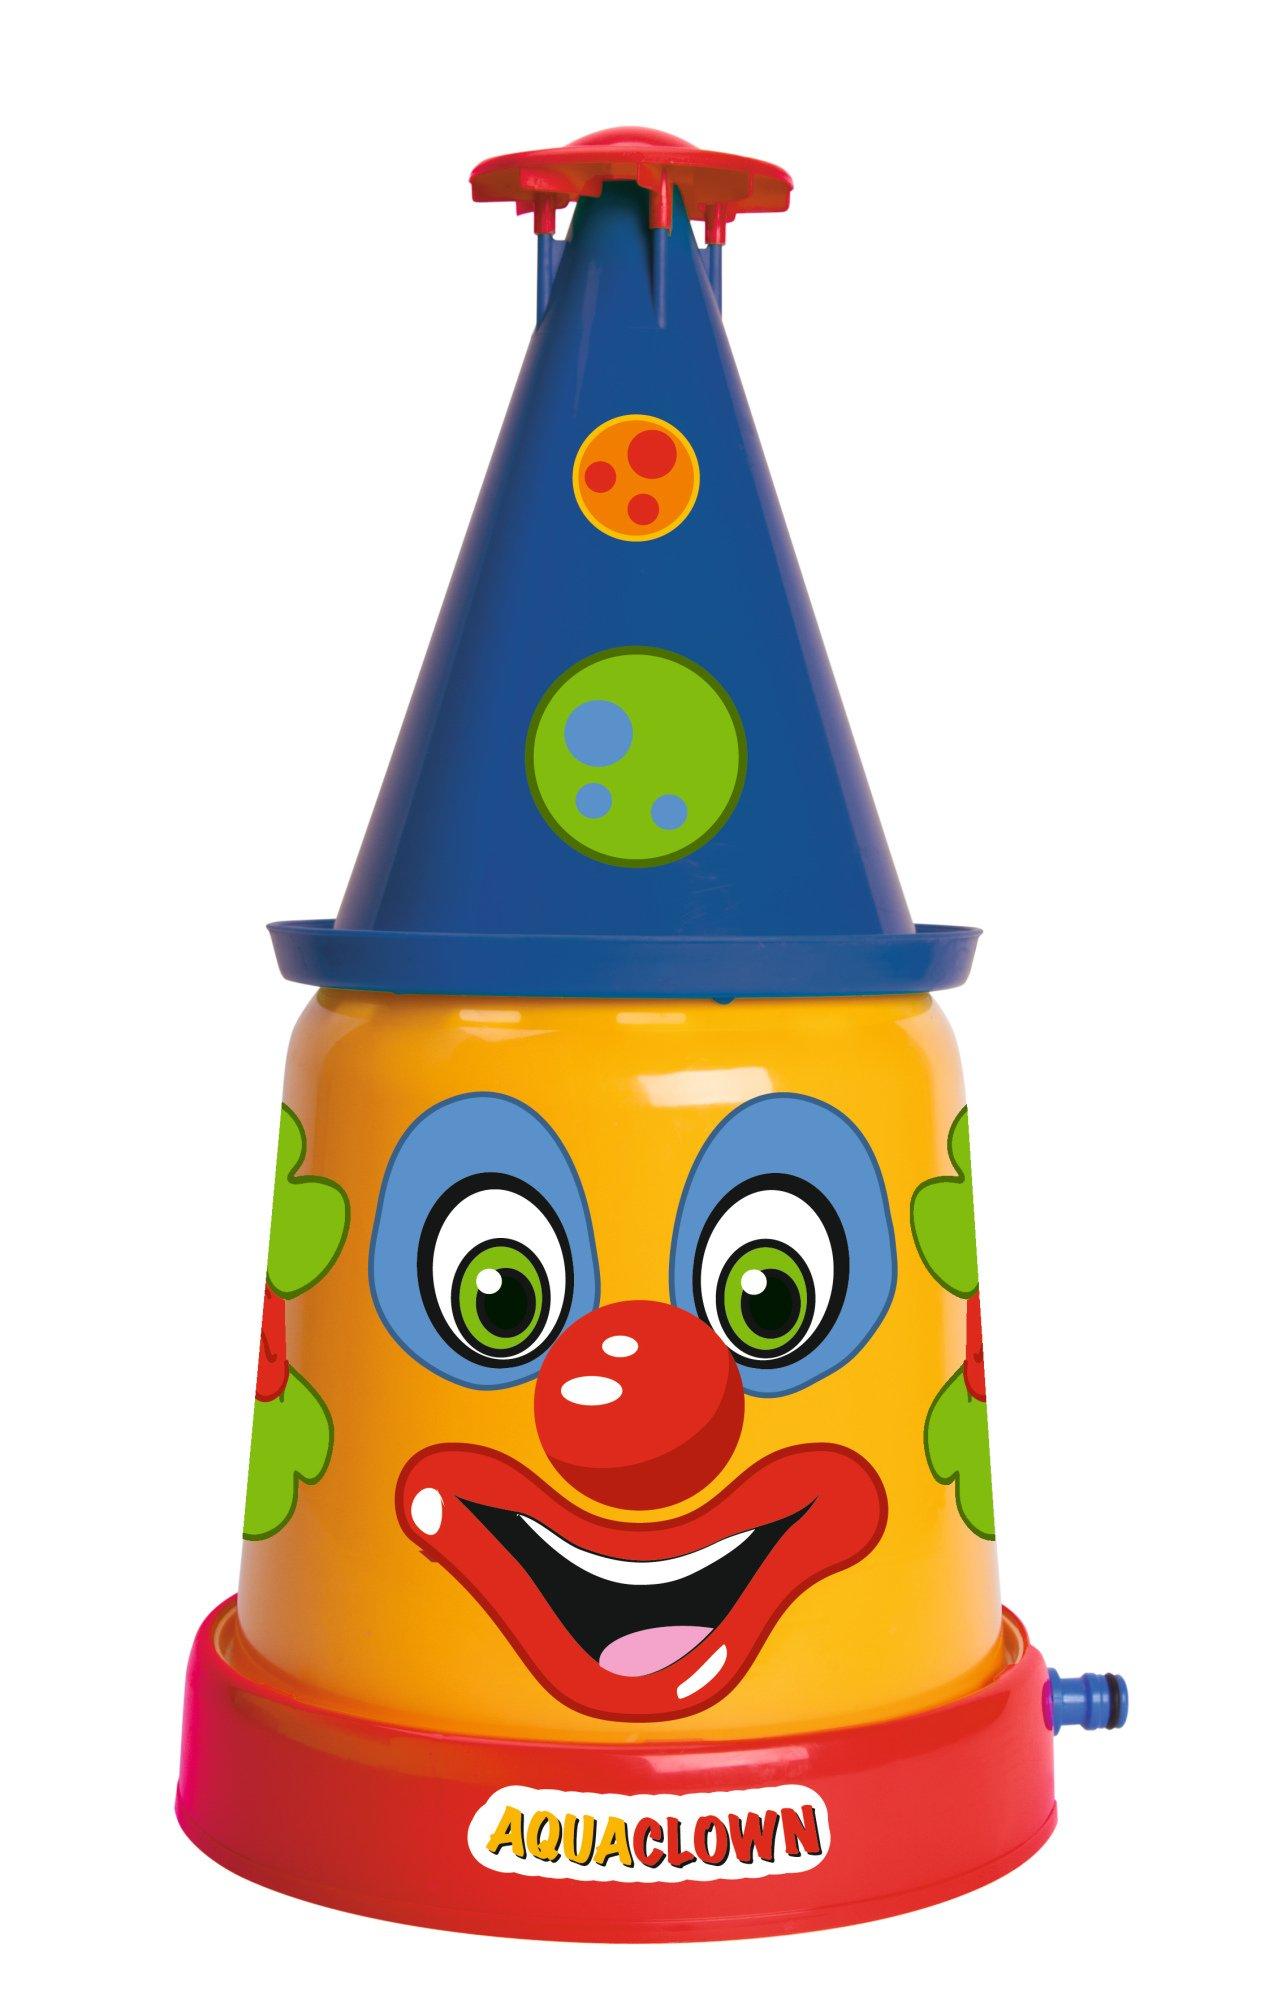 Big Androni Aqua Clown Sprinkler Toy by Big